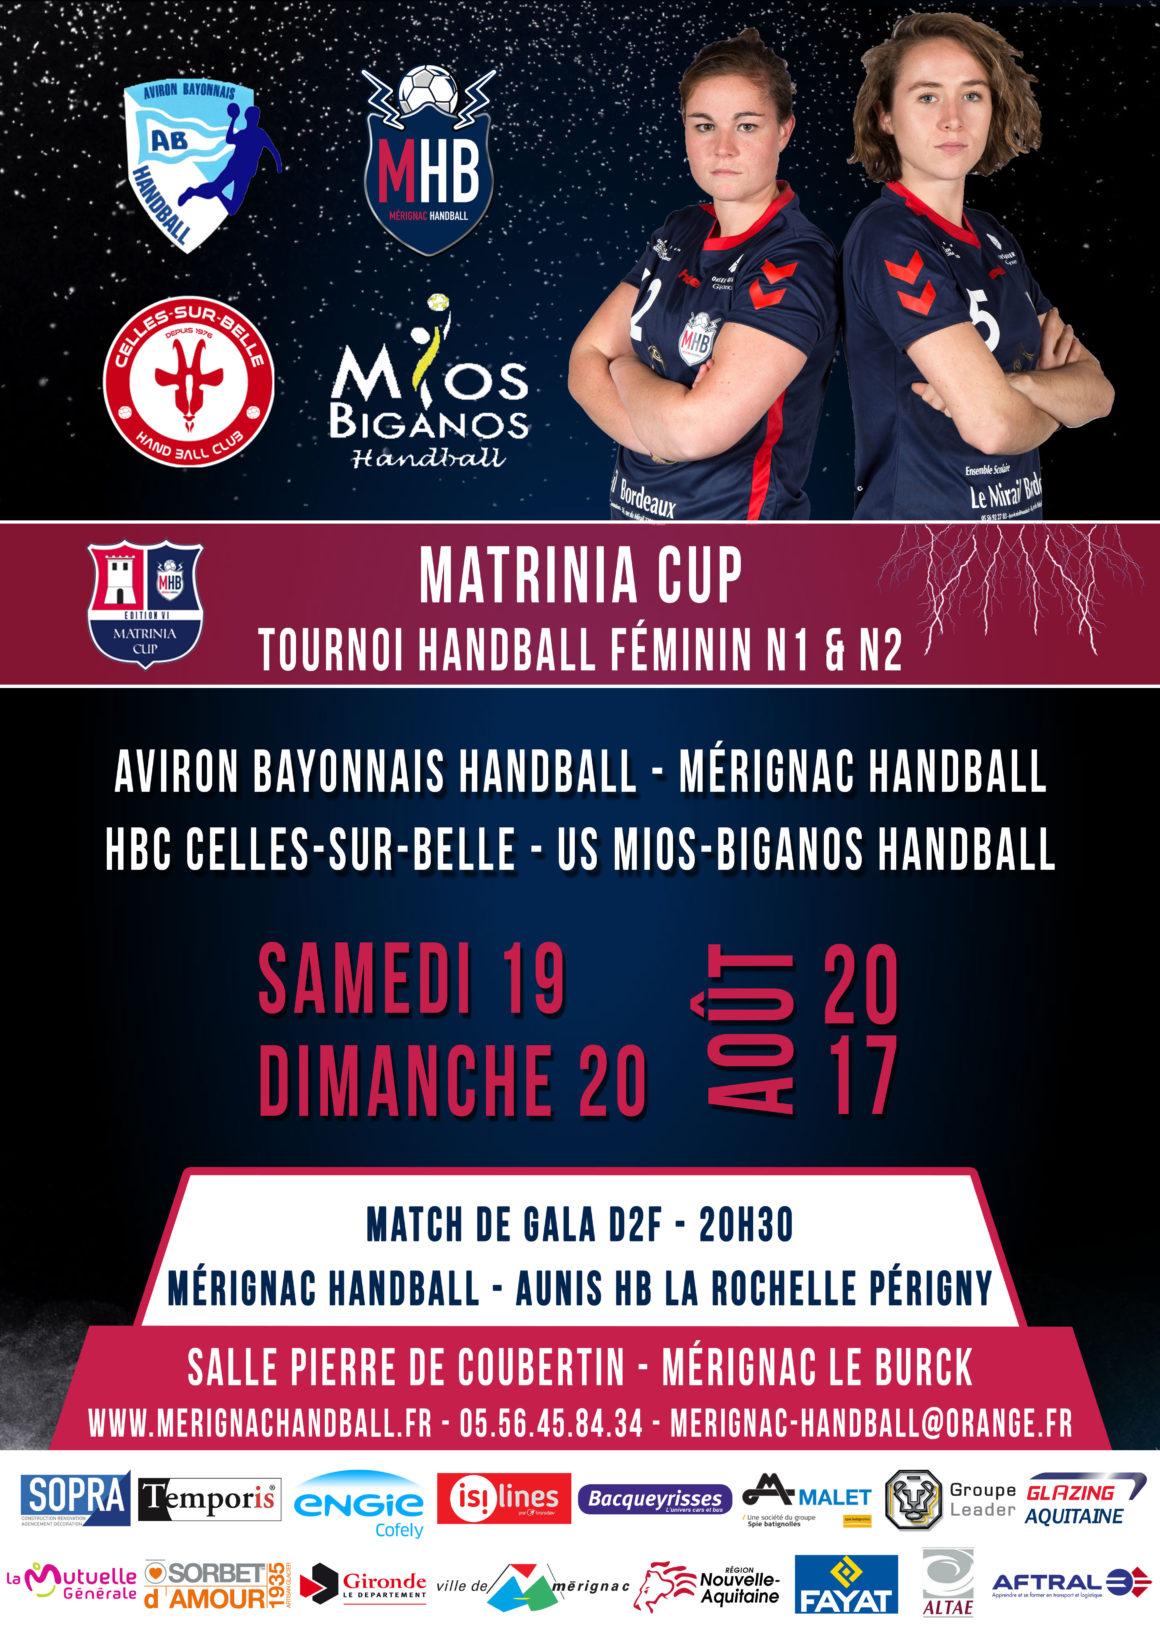 Matrinia Cup 2017